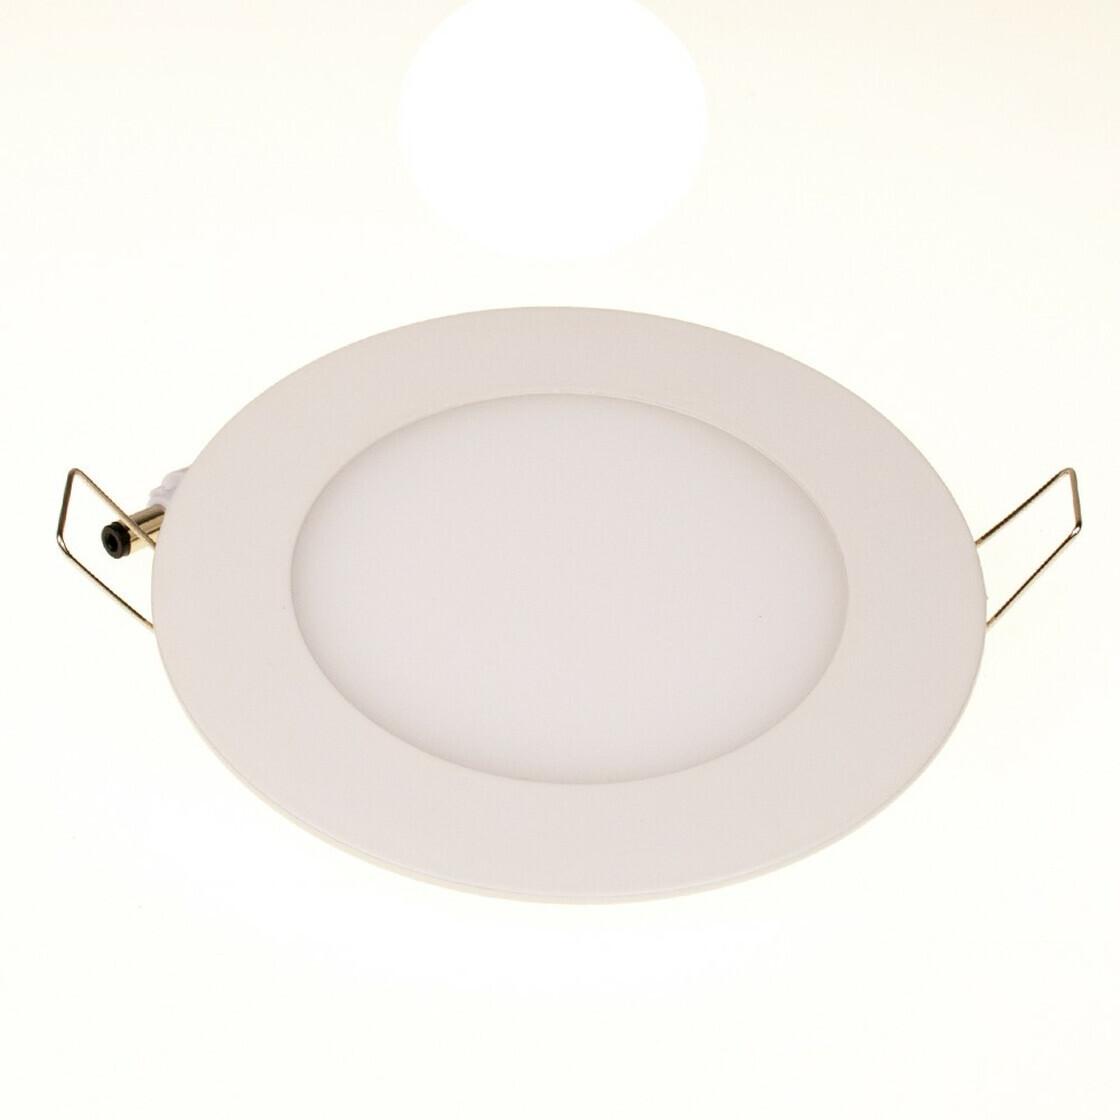 1 Stück  Hängelampe Lampe 12 V